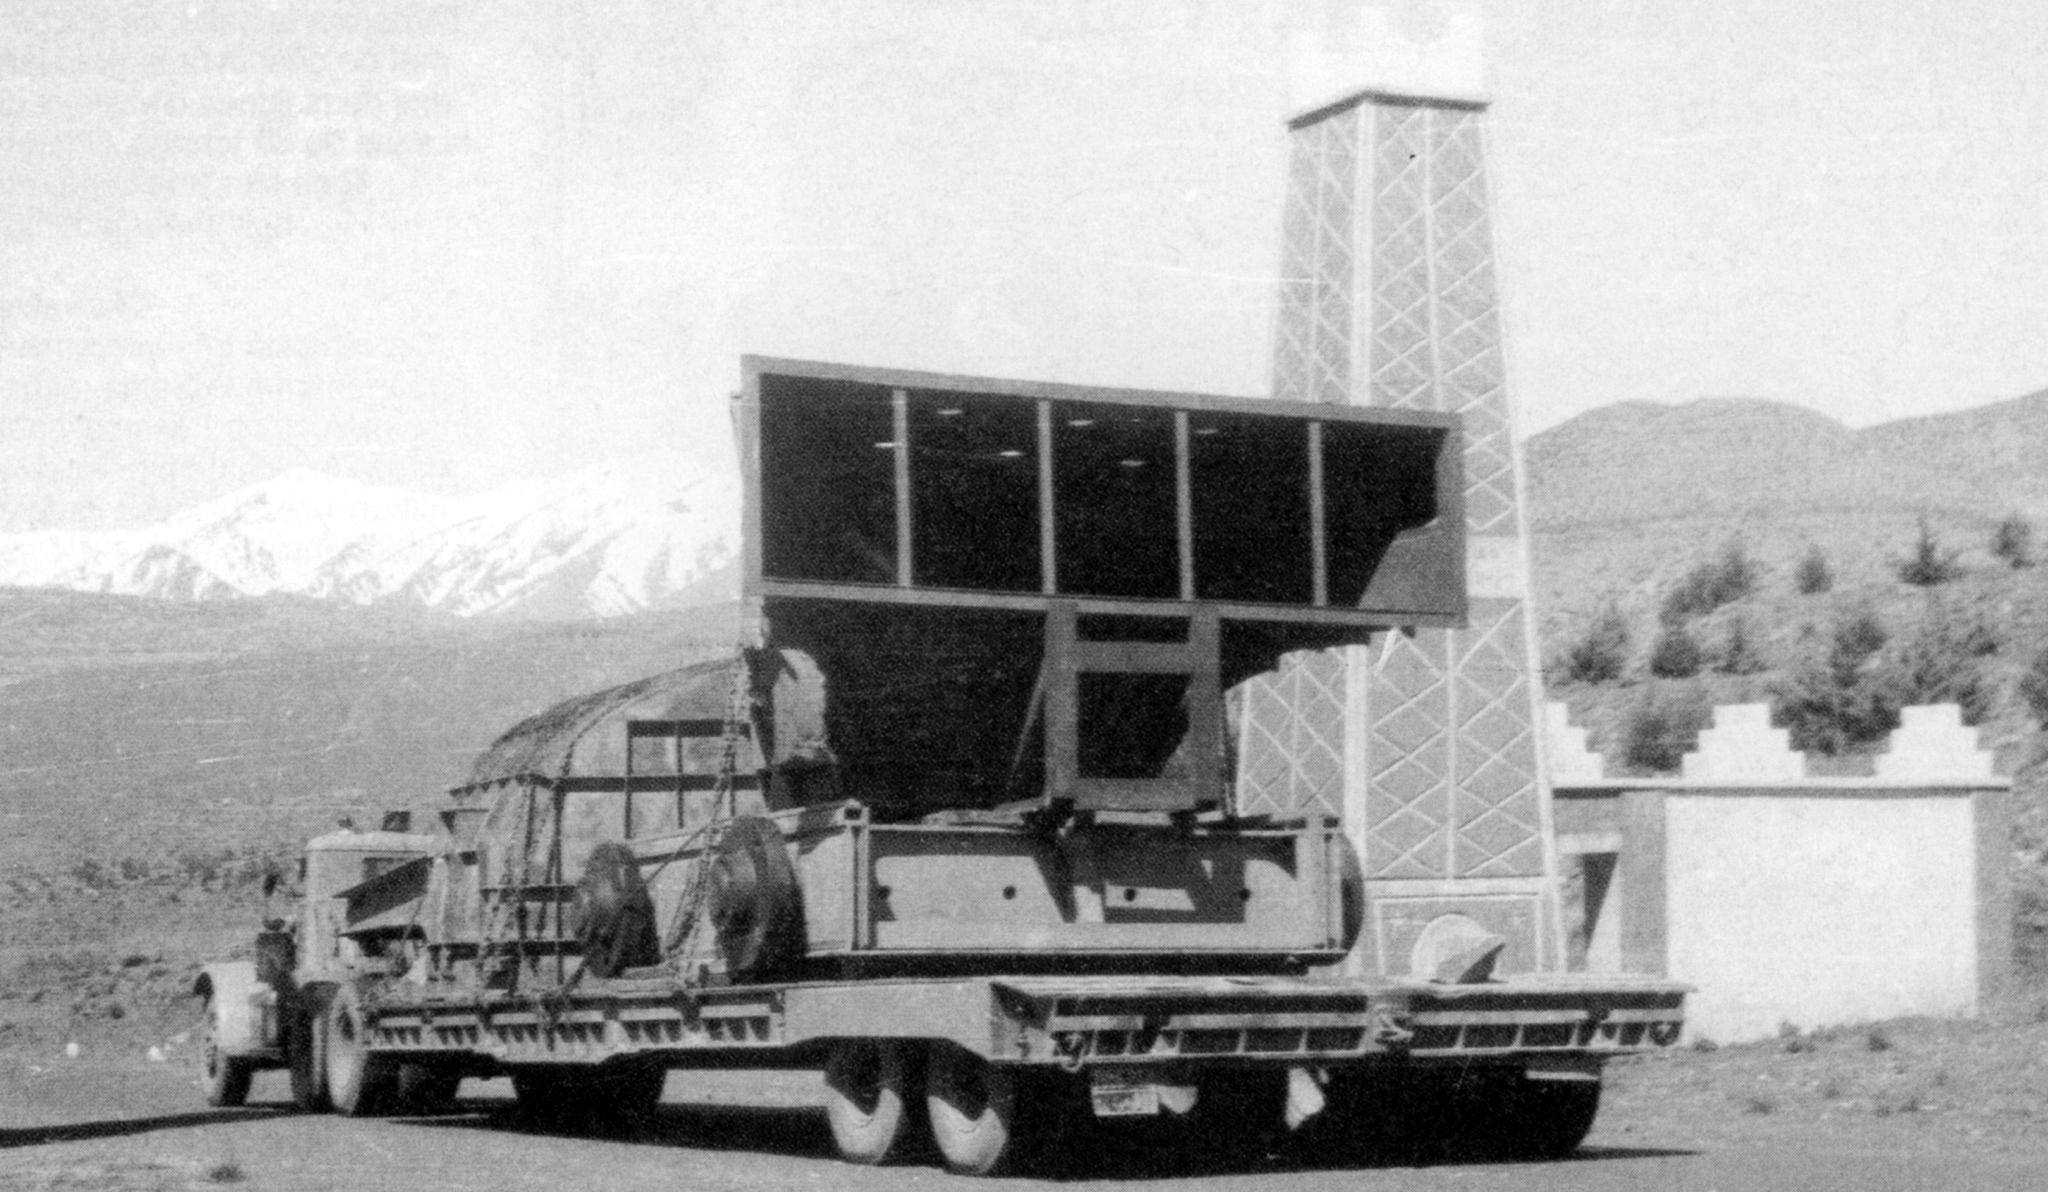 Transport Routier au Maroc - Histoire - Page 3 49911525022_e6c66fc3e1_o_d